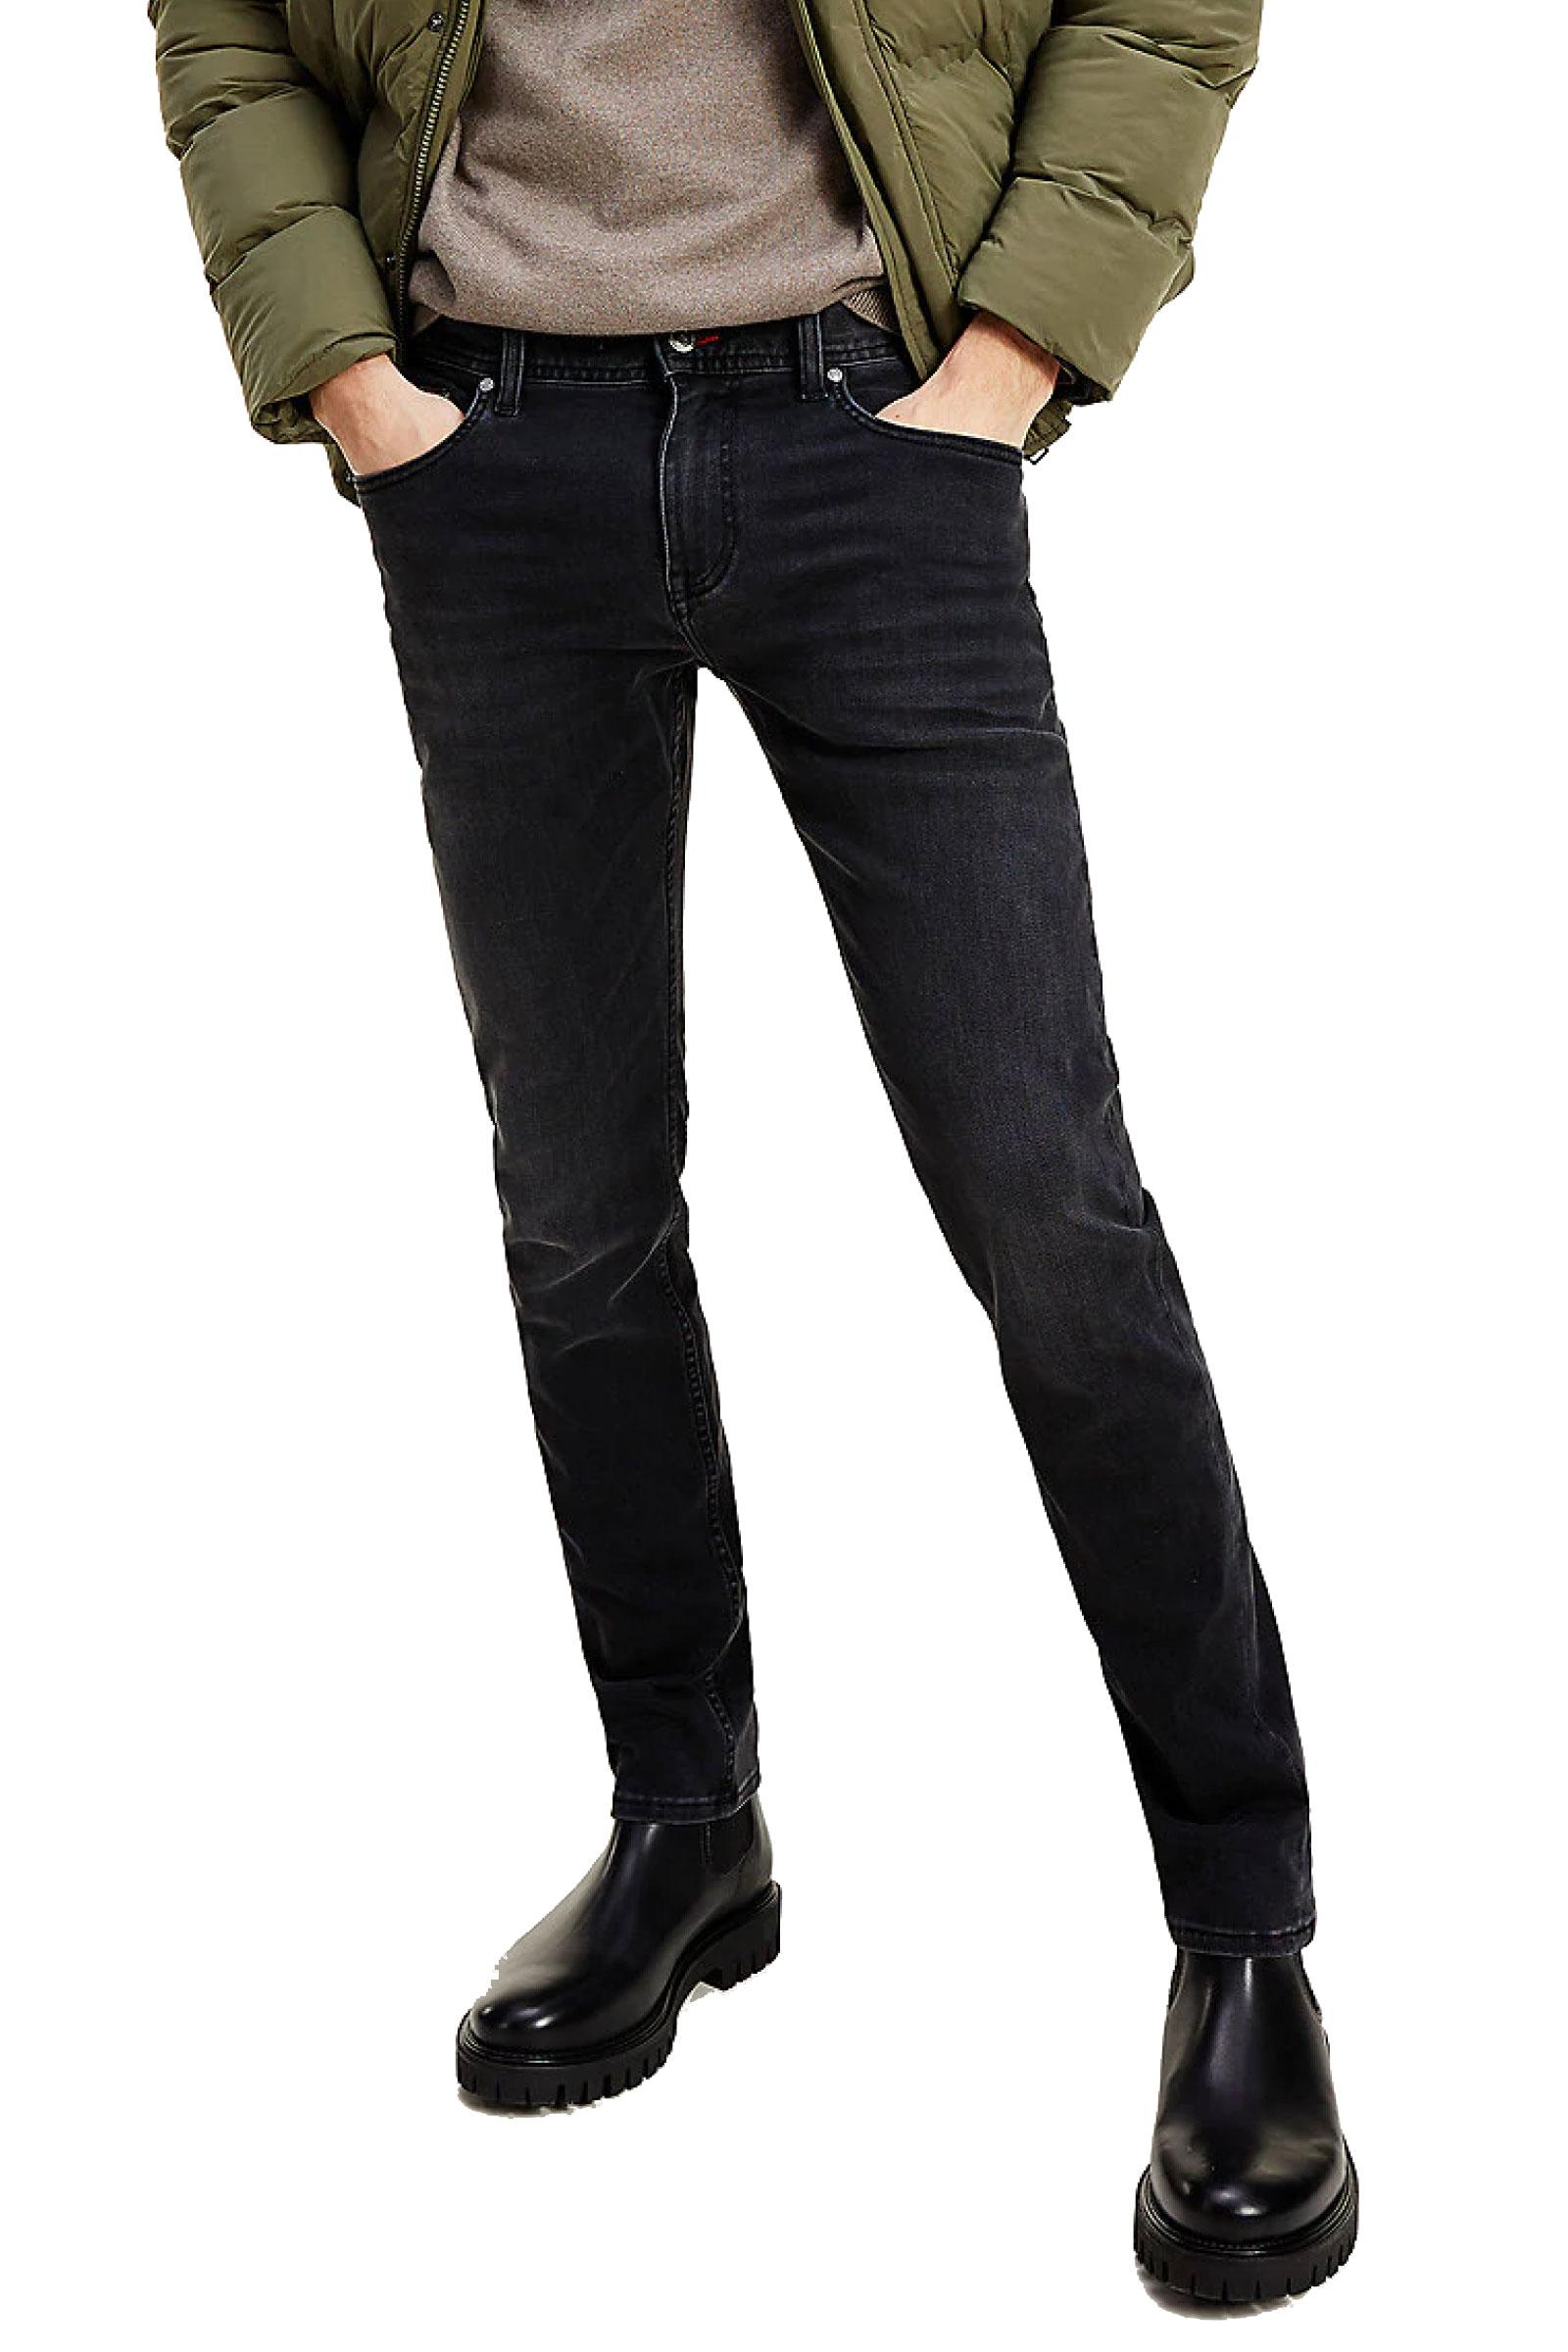 TOMMY HILFIGER TOMMY HILFIGER | Jeans | MW0MW159541B4